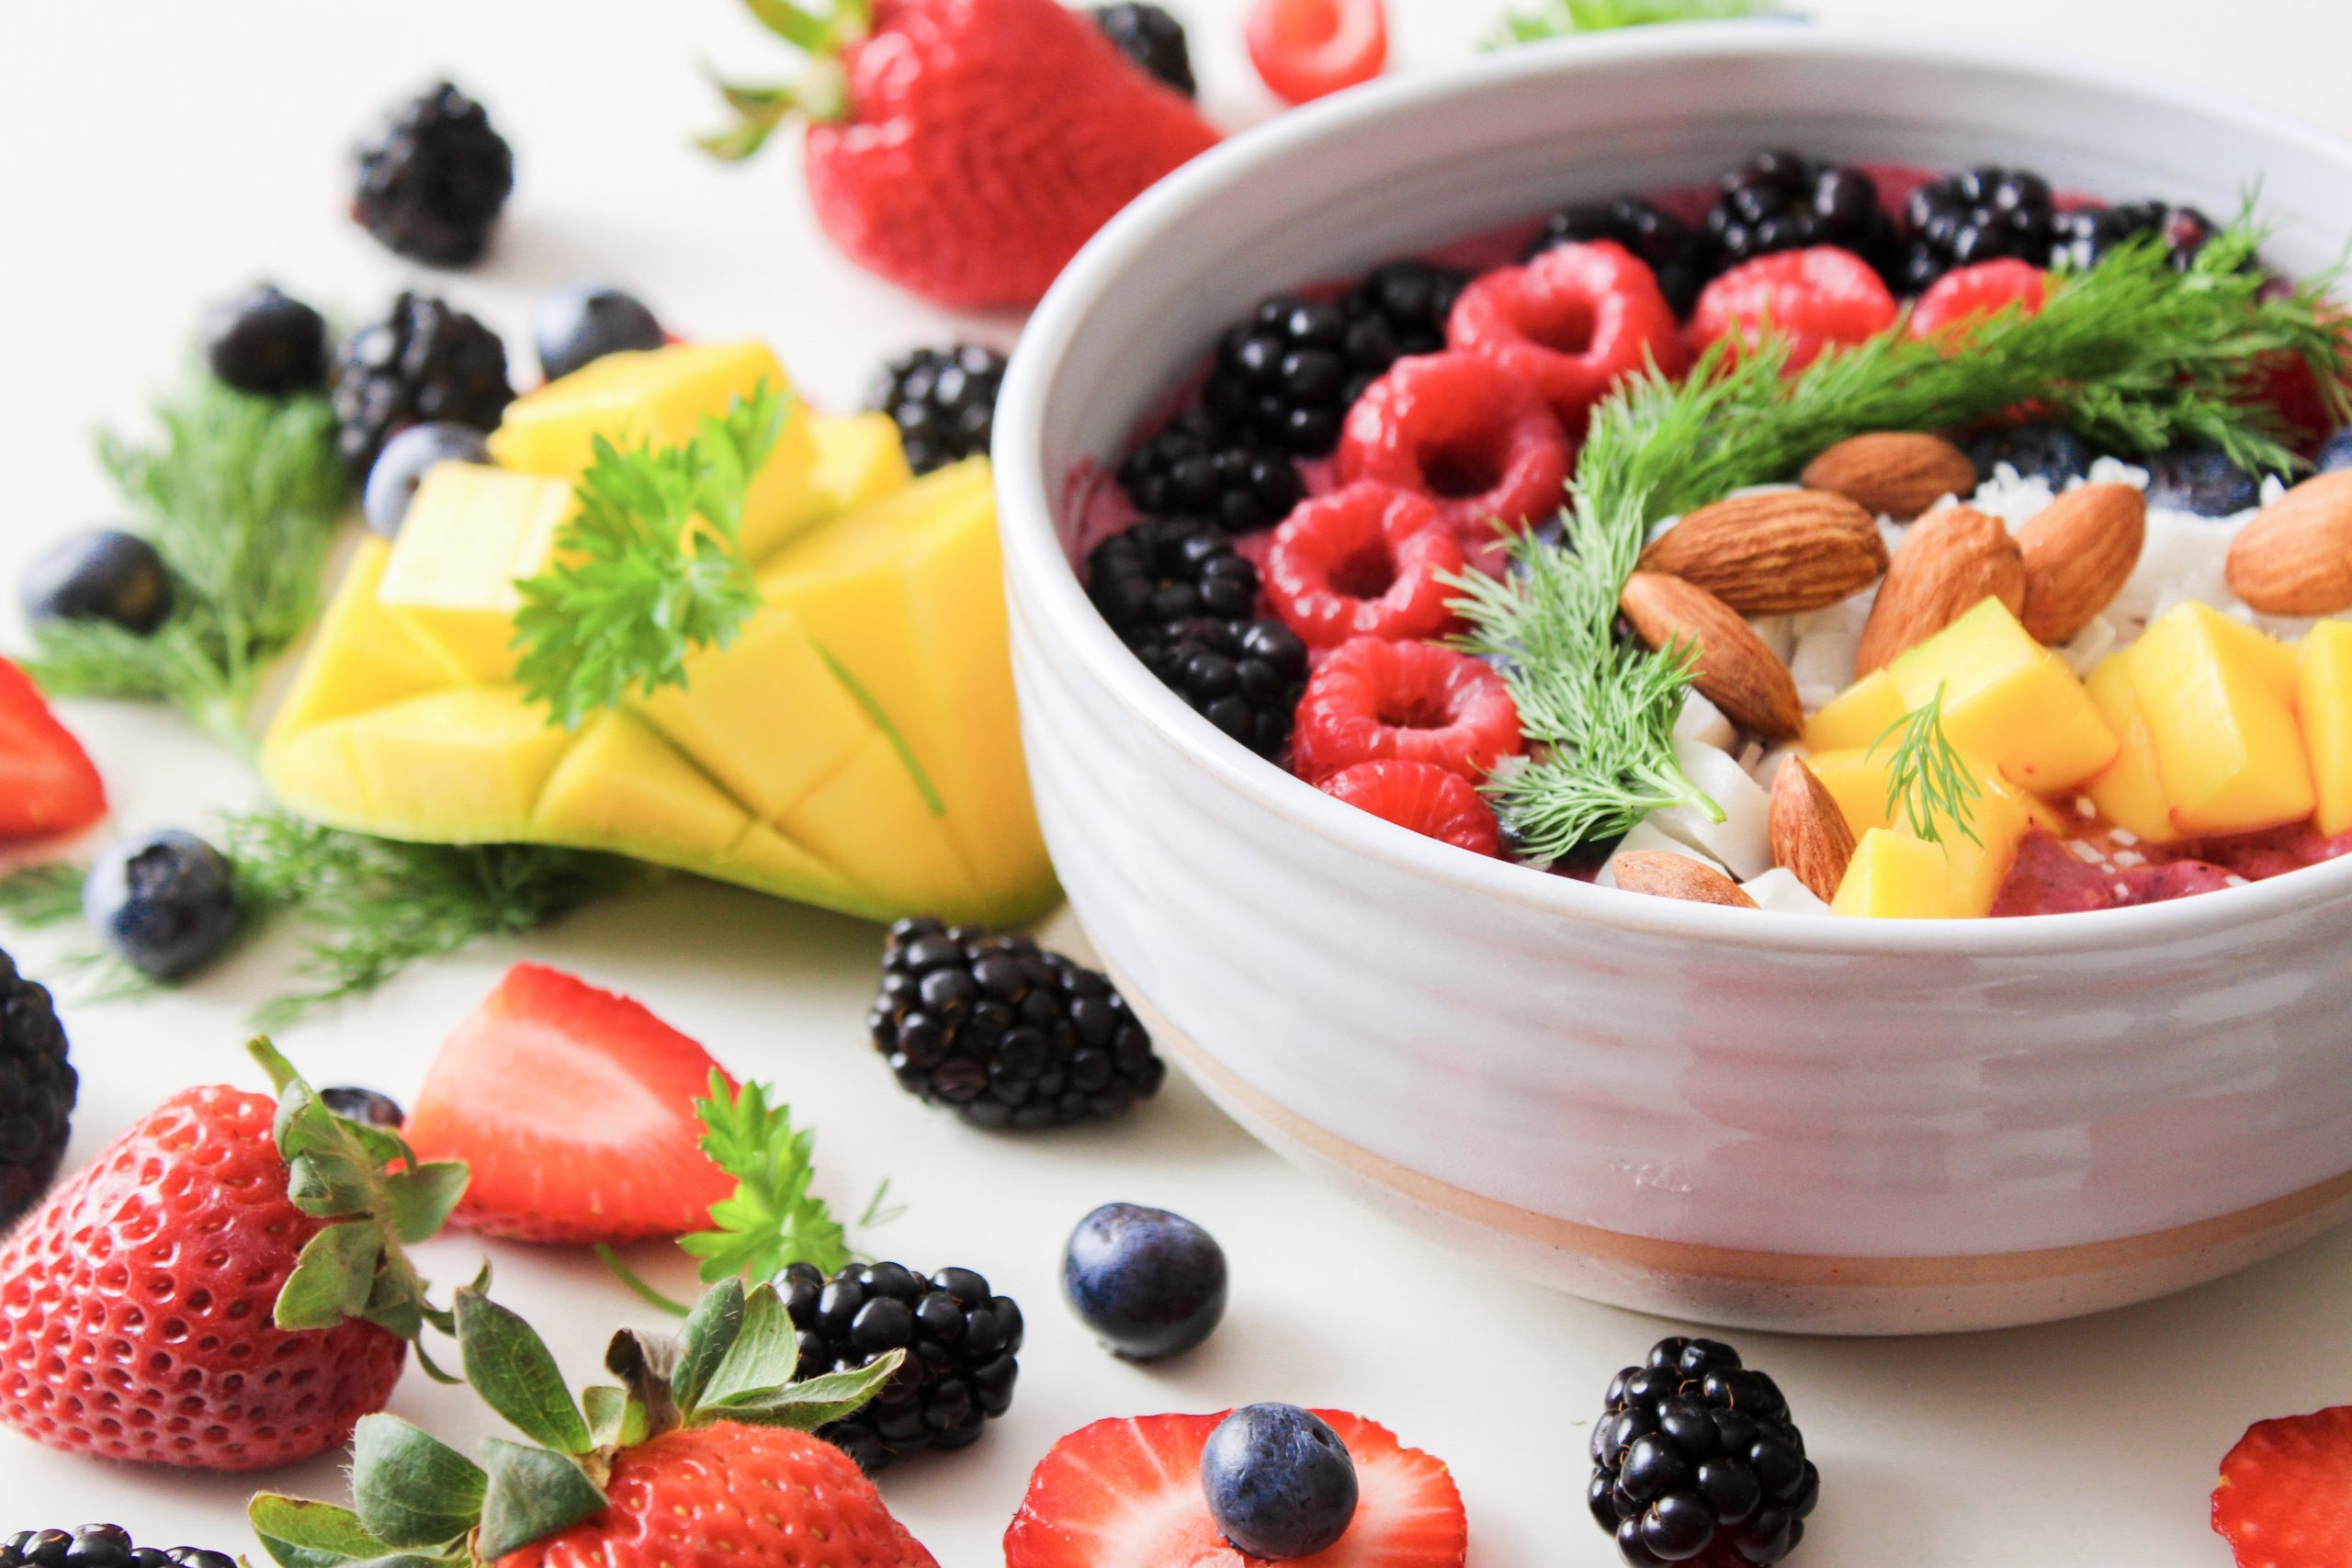 fruit salad in white ceramic bowl 1105166 scaled